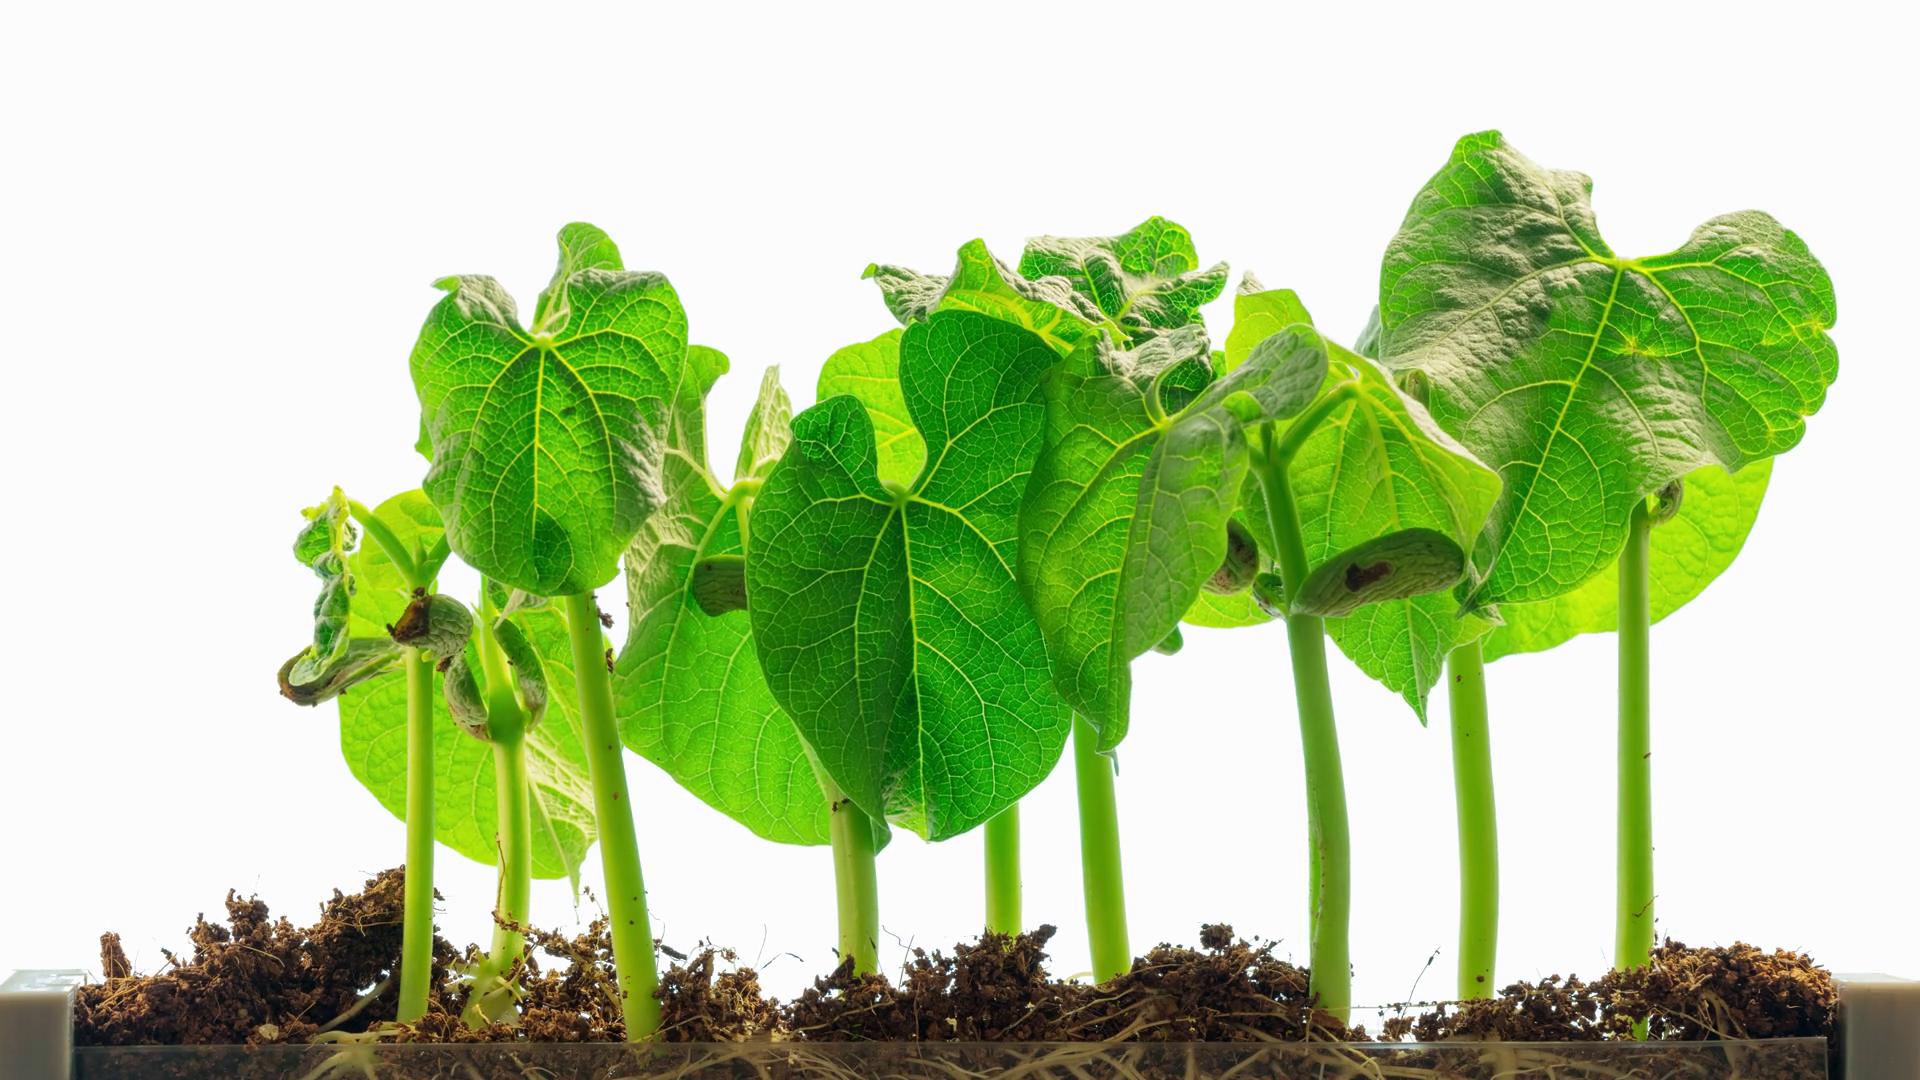 Bean Plant Png & Free Bean Plant.png Transparent Images #11271.